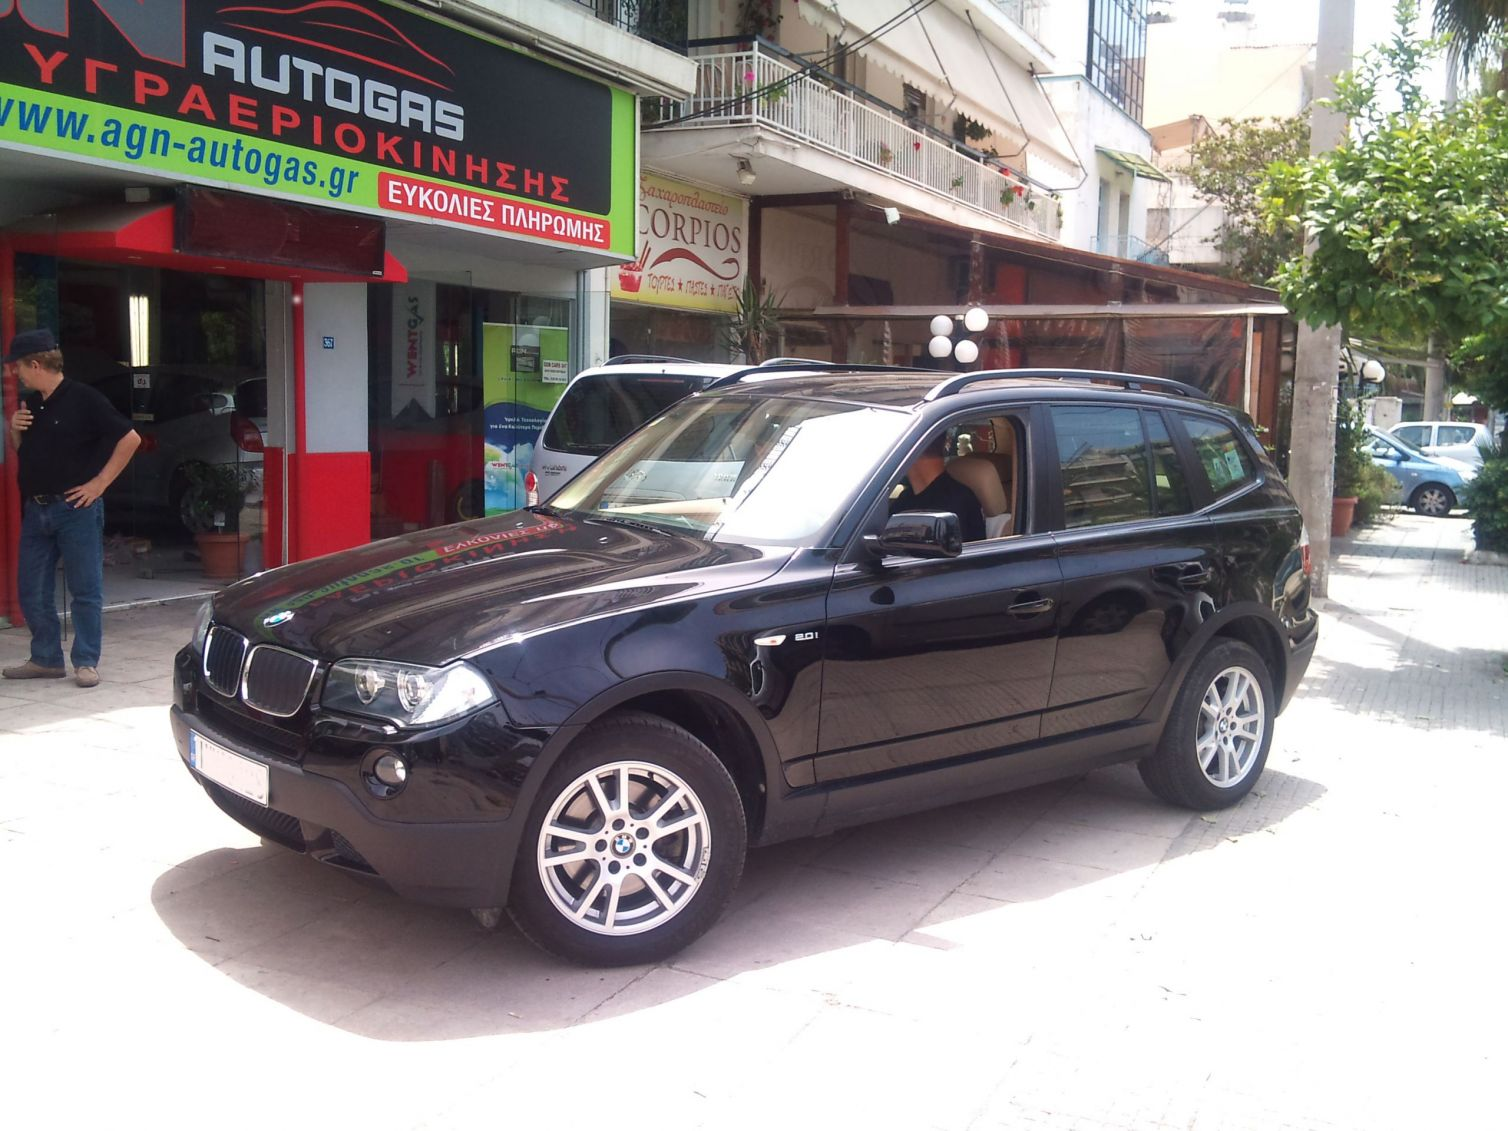 BMW X3 2000cc '07 ME BRC P&D 60ΛΤ